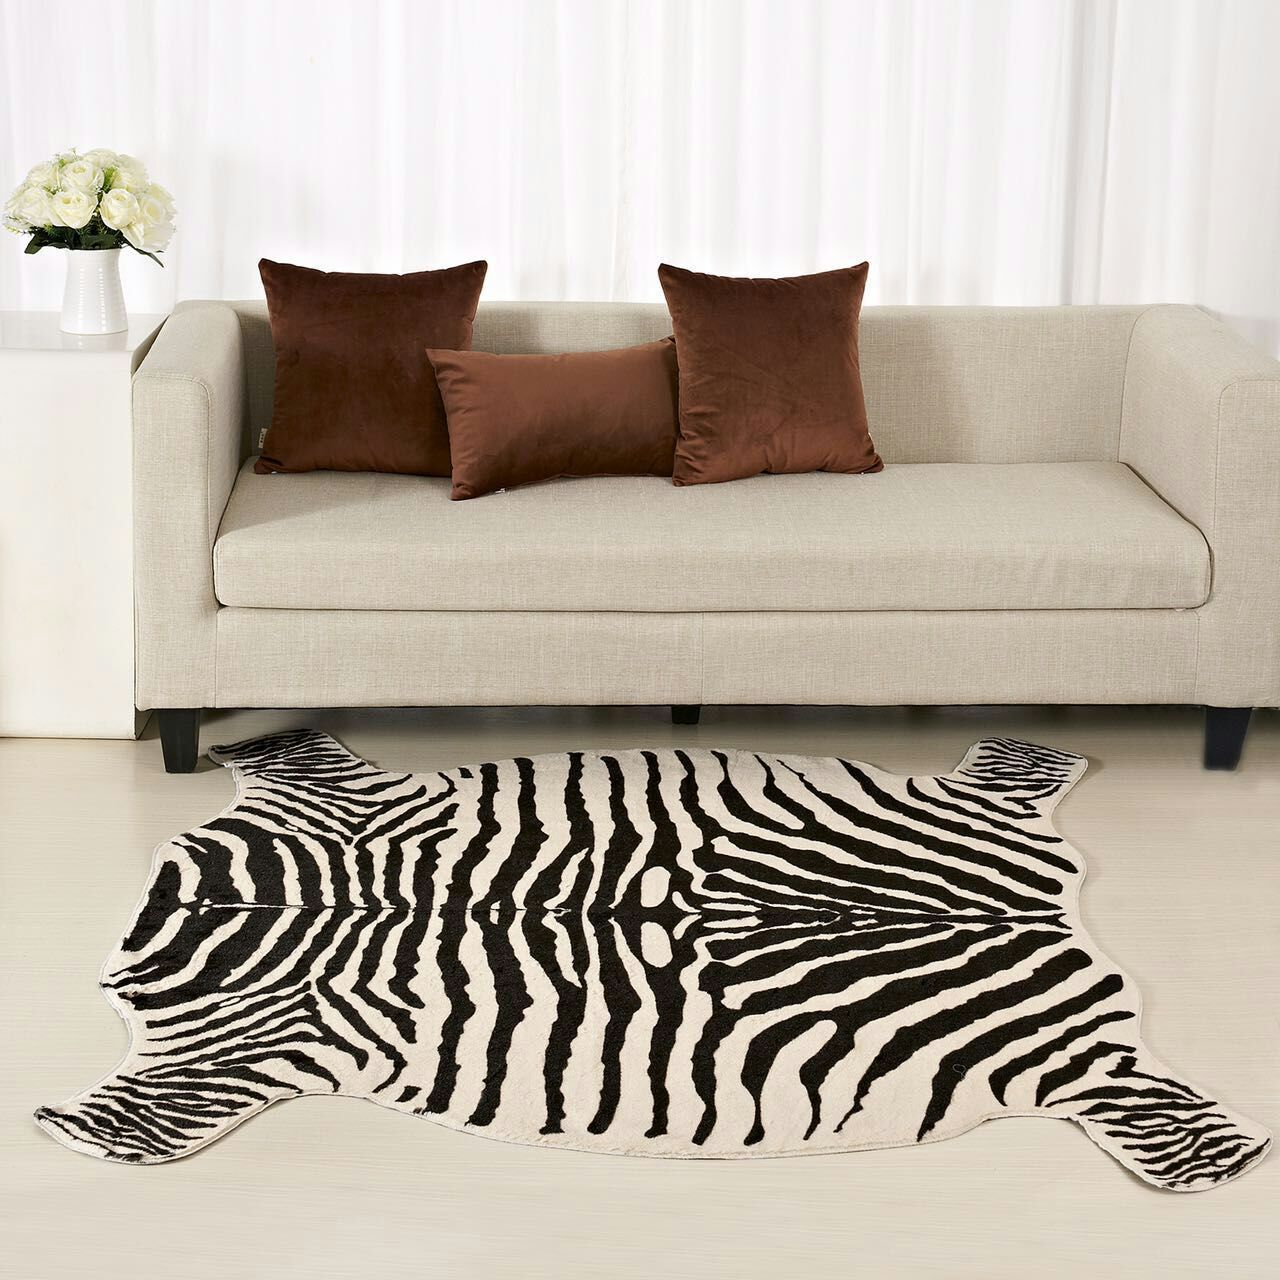 Zebra/Cow Printed Carpet PV Velvet Imitation Leather Rugs Animal Skins Natural Shape Carpets Decoration Mats